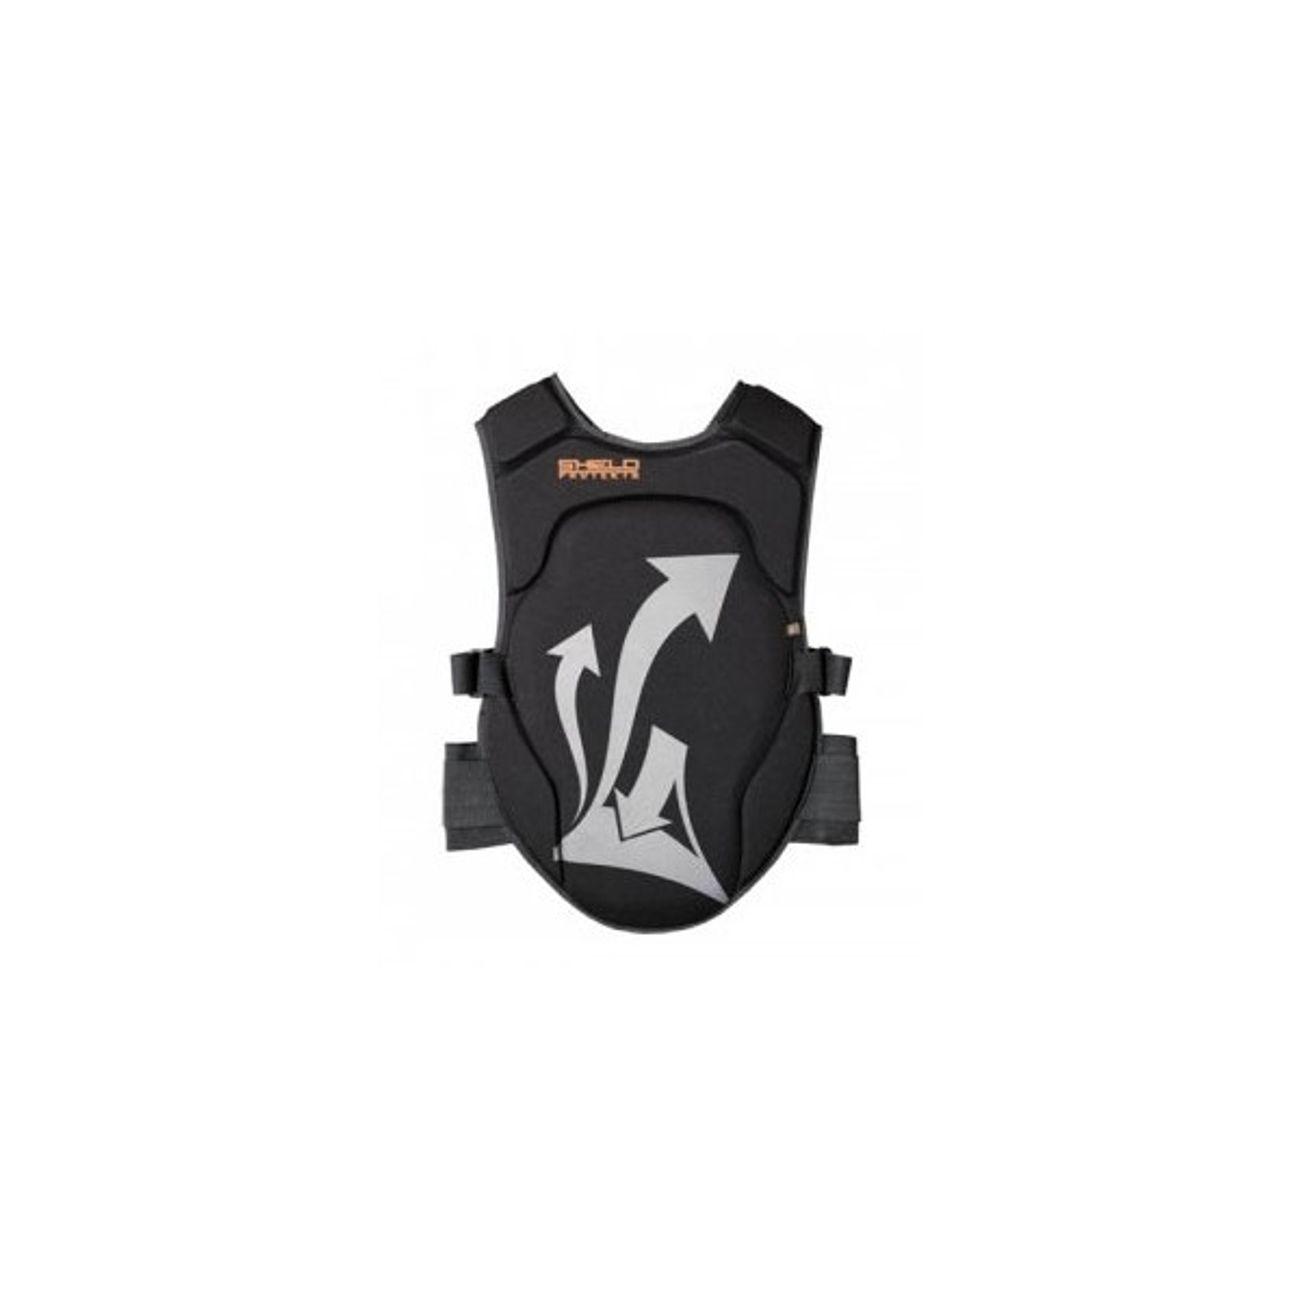 Snowboard  DEMON DEMON XD30 SPINE PROTECTOR